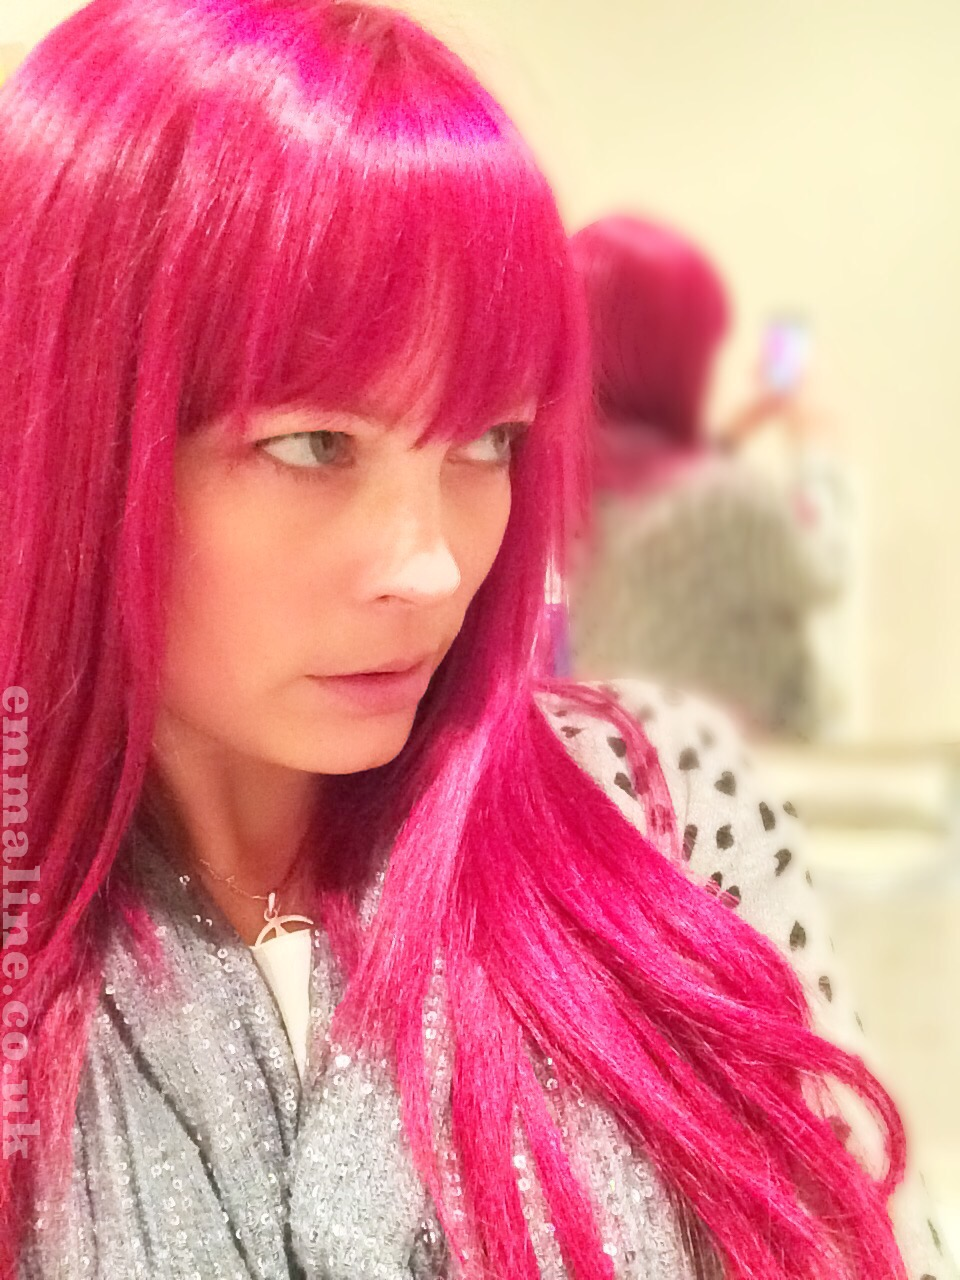 Bright pink hair girl